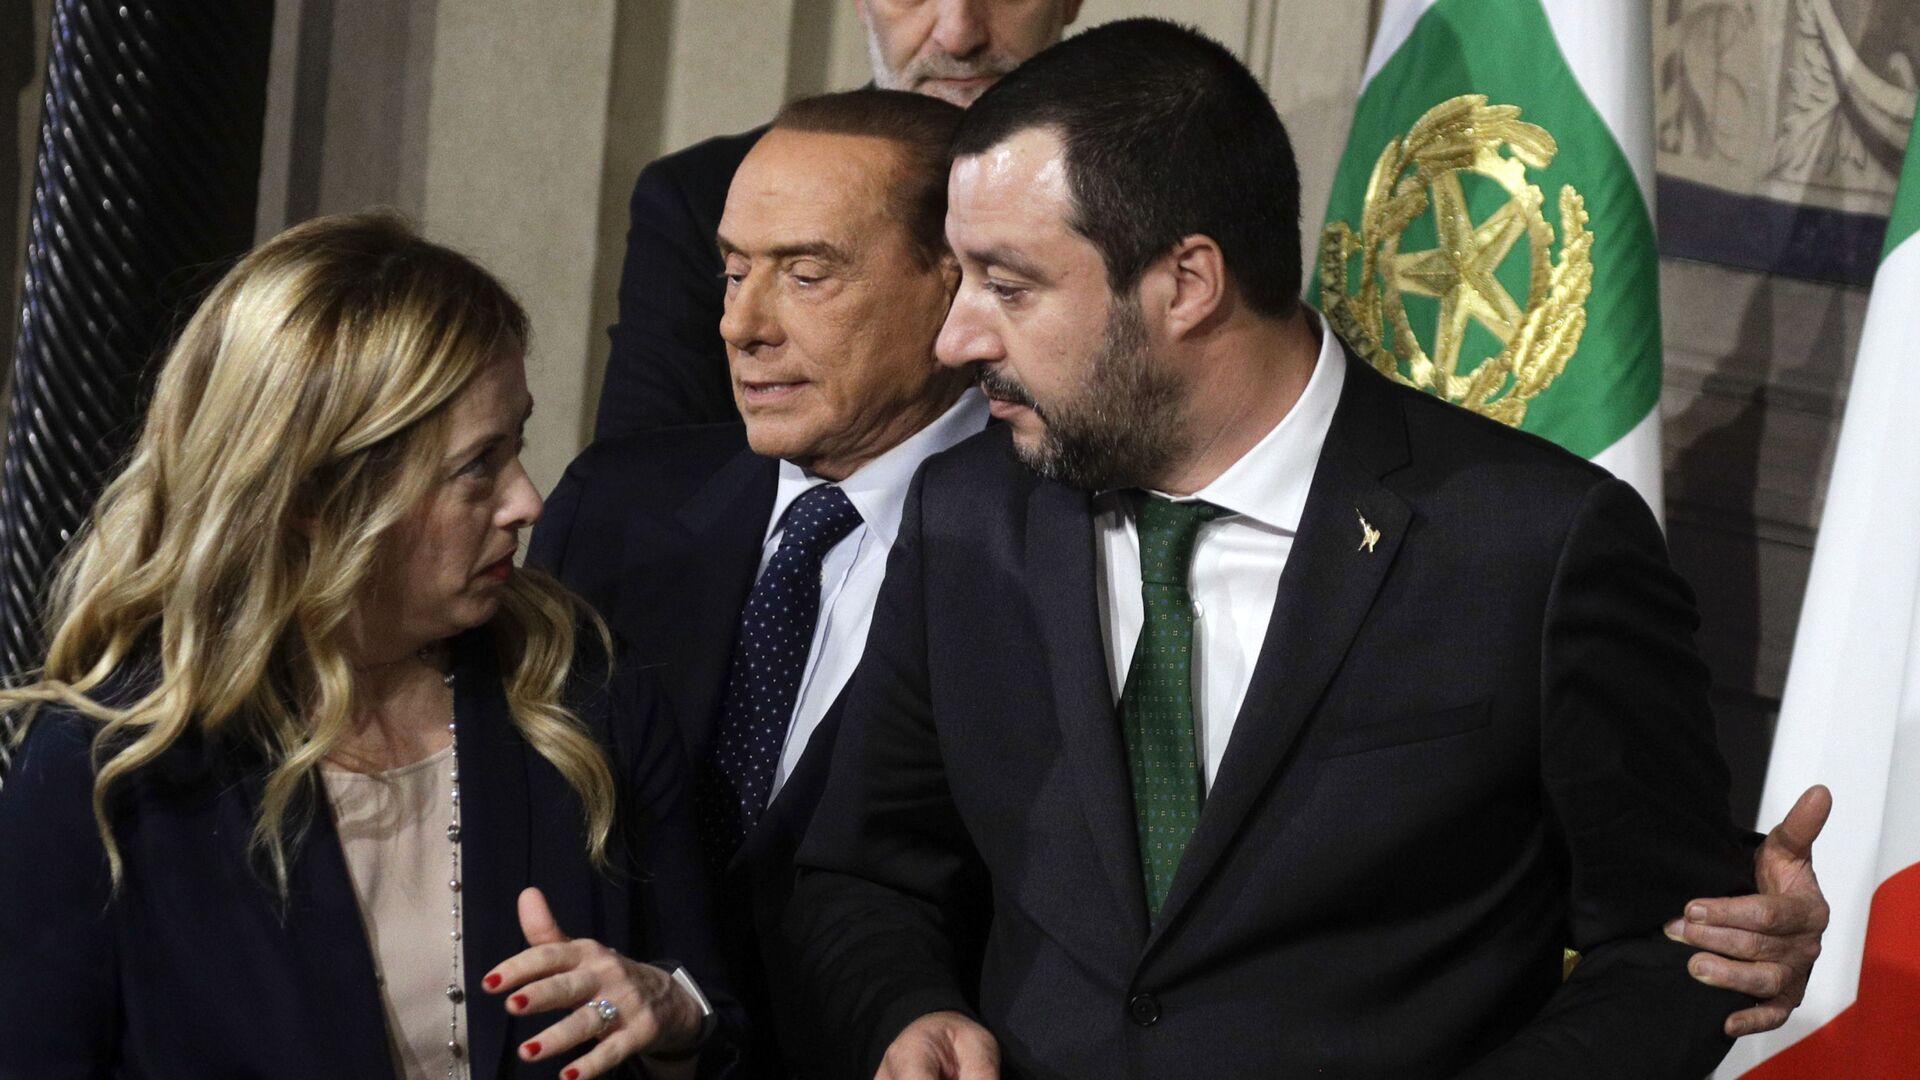 Matteo Salvini e Giorgia Meloni e Silvio Berlusconi - Sputnik Italia, 1920, 03.02.2021